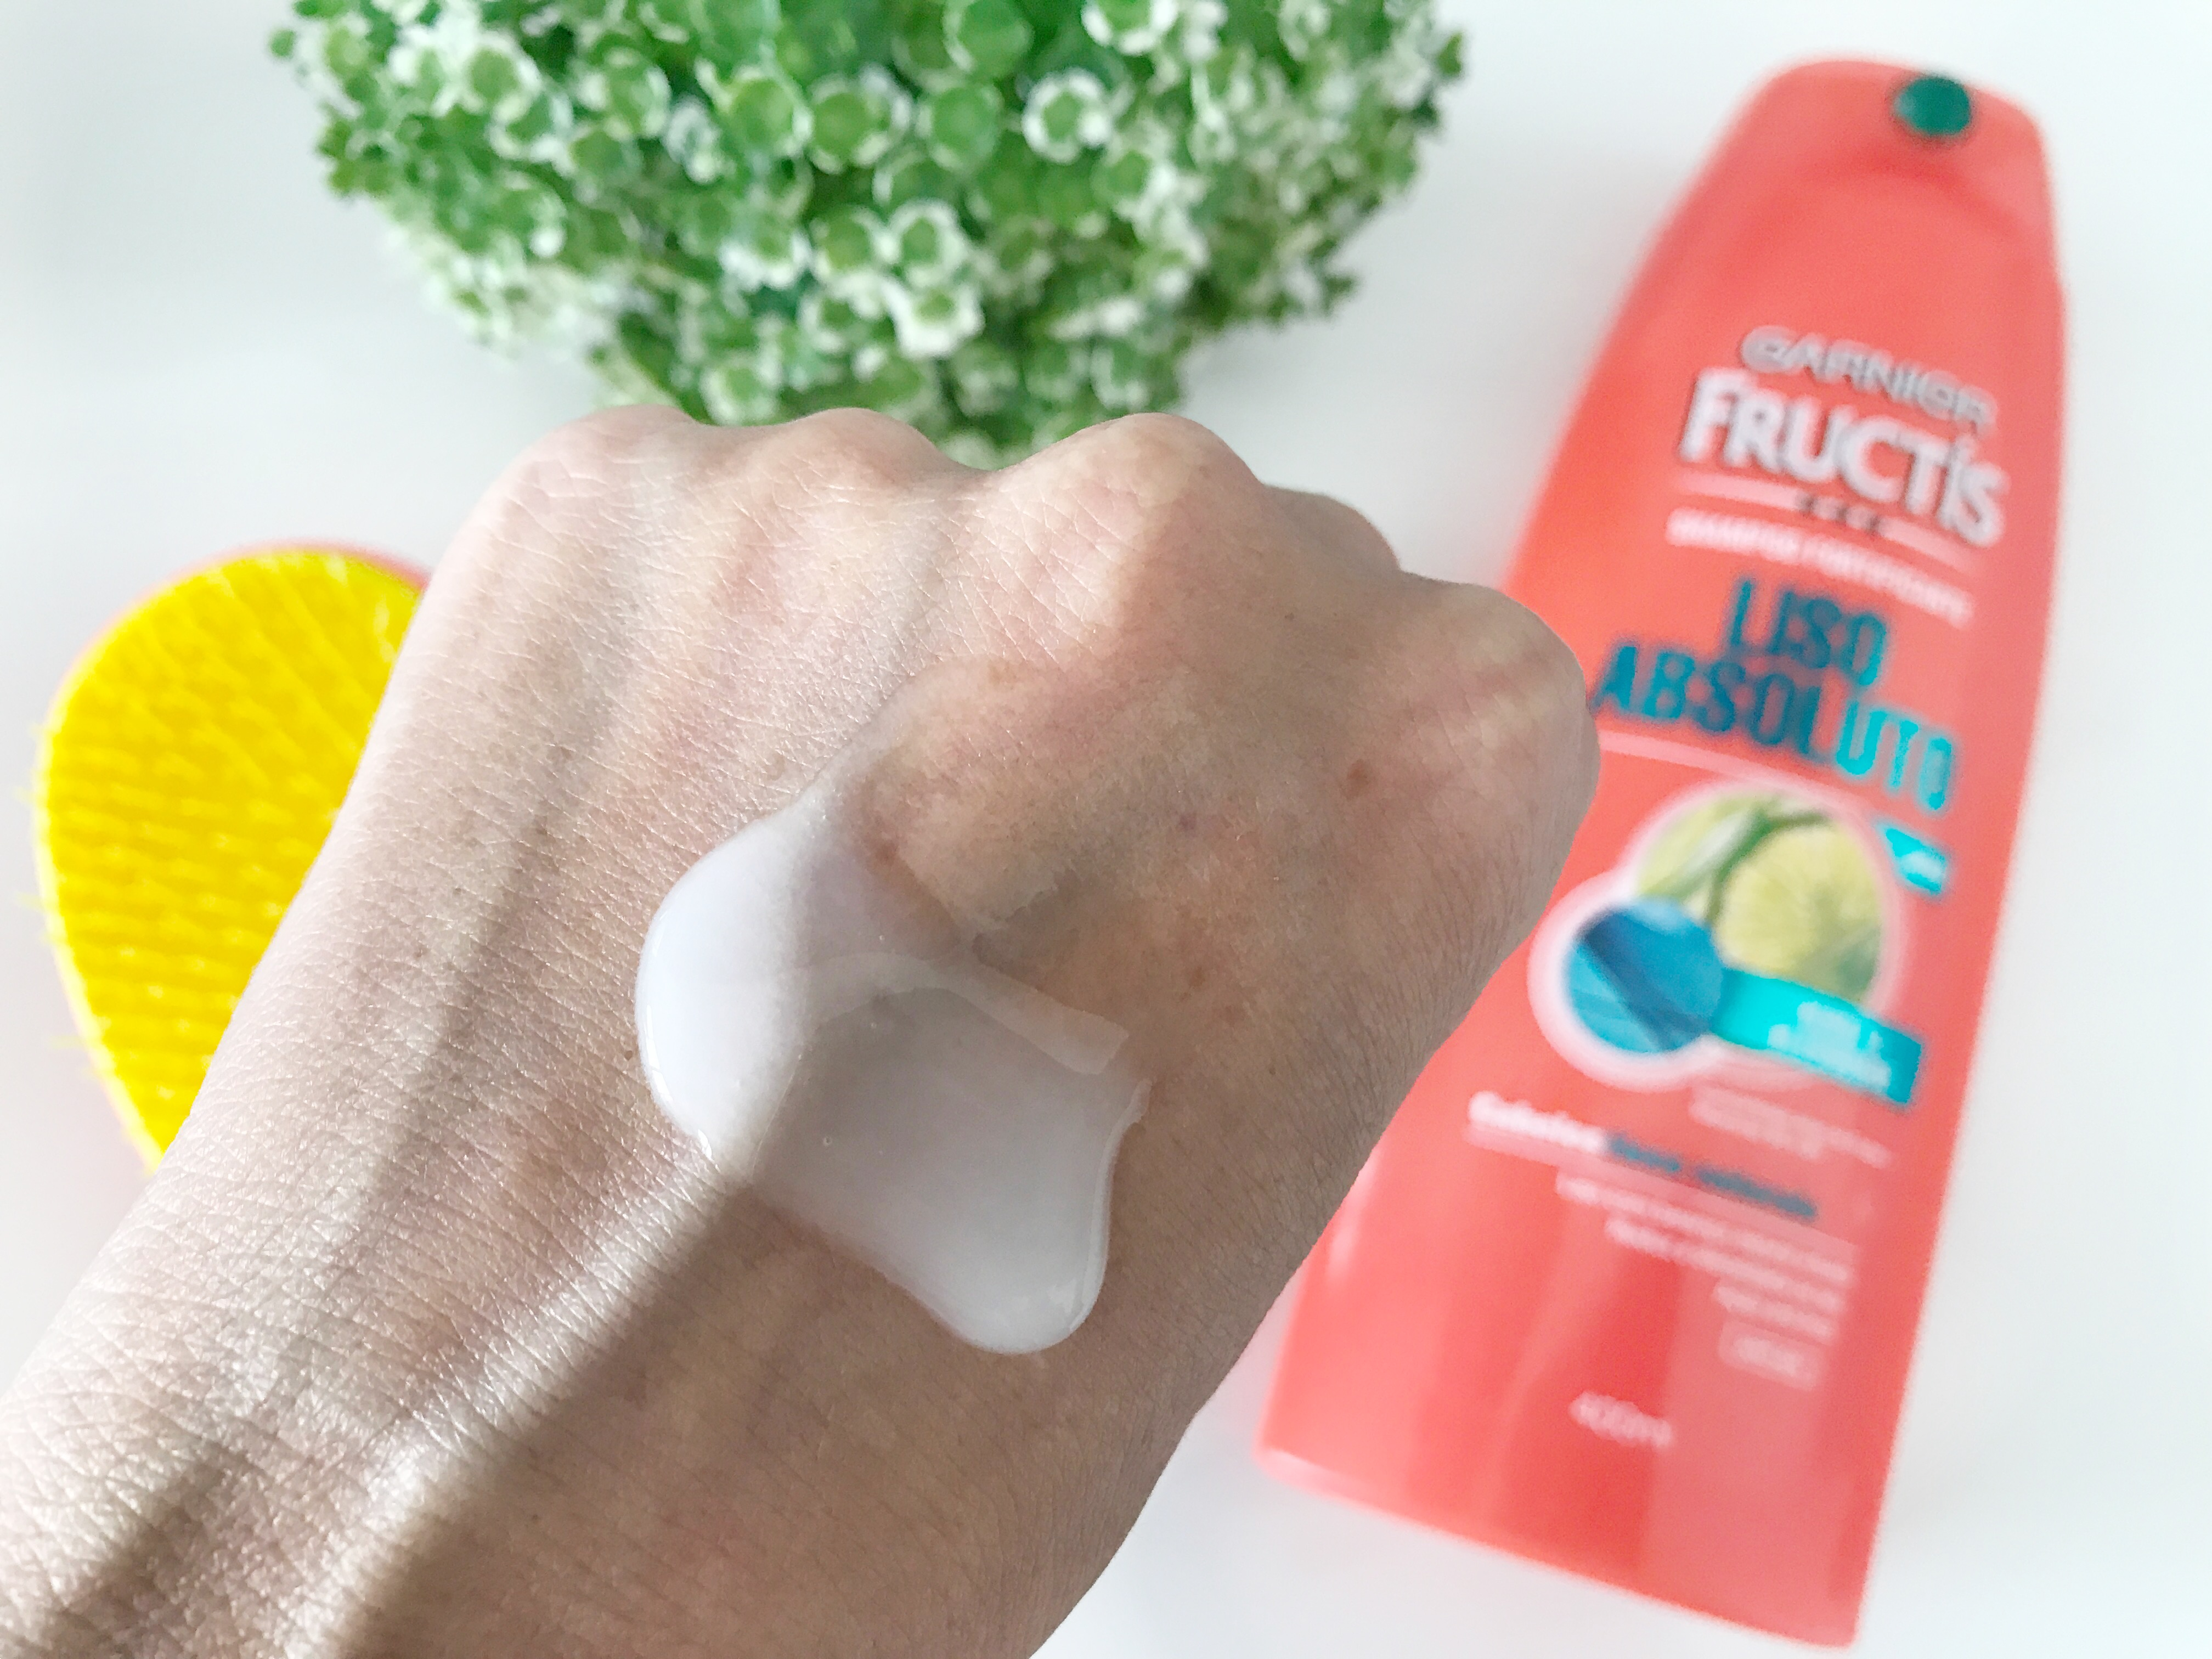 resenha-shampoo-condicionador-fructis-lisoabsoluto-giulicastro